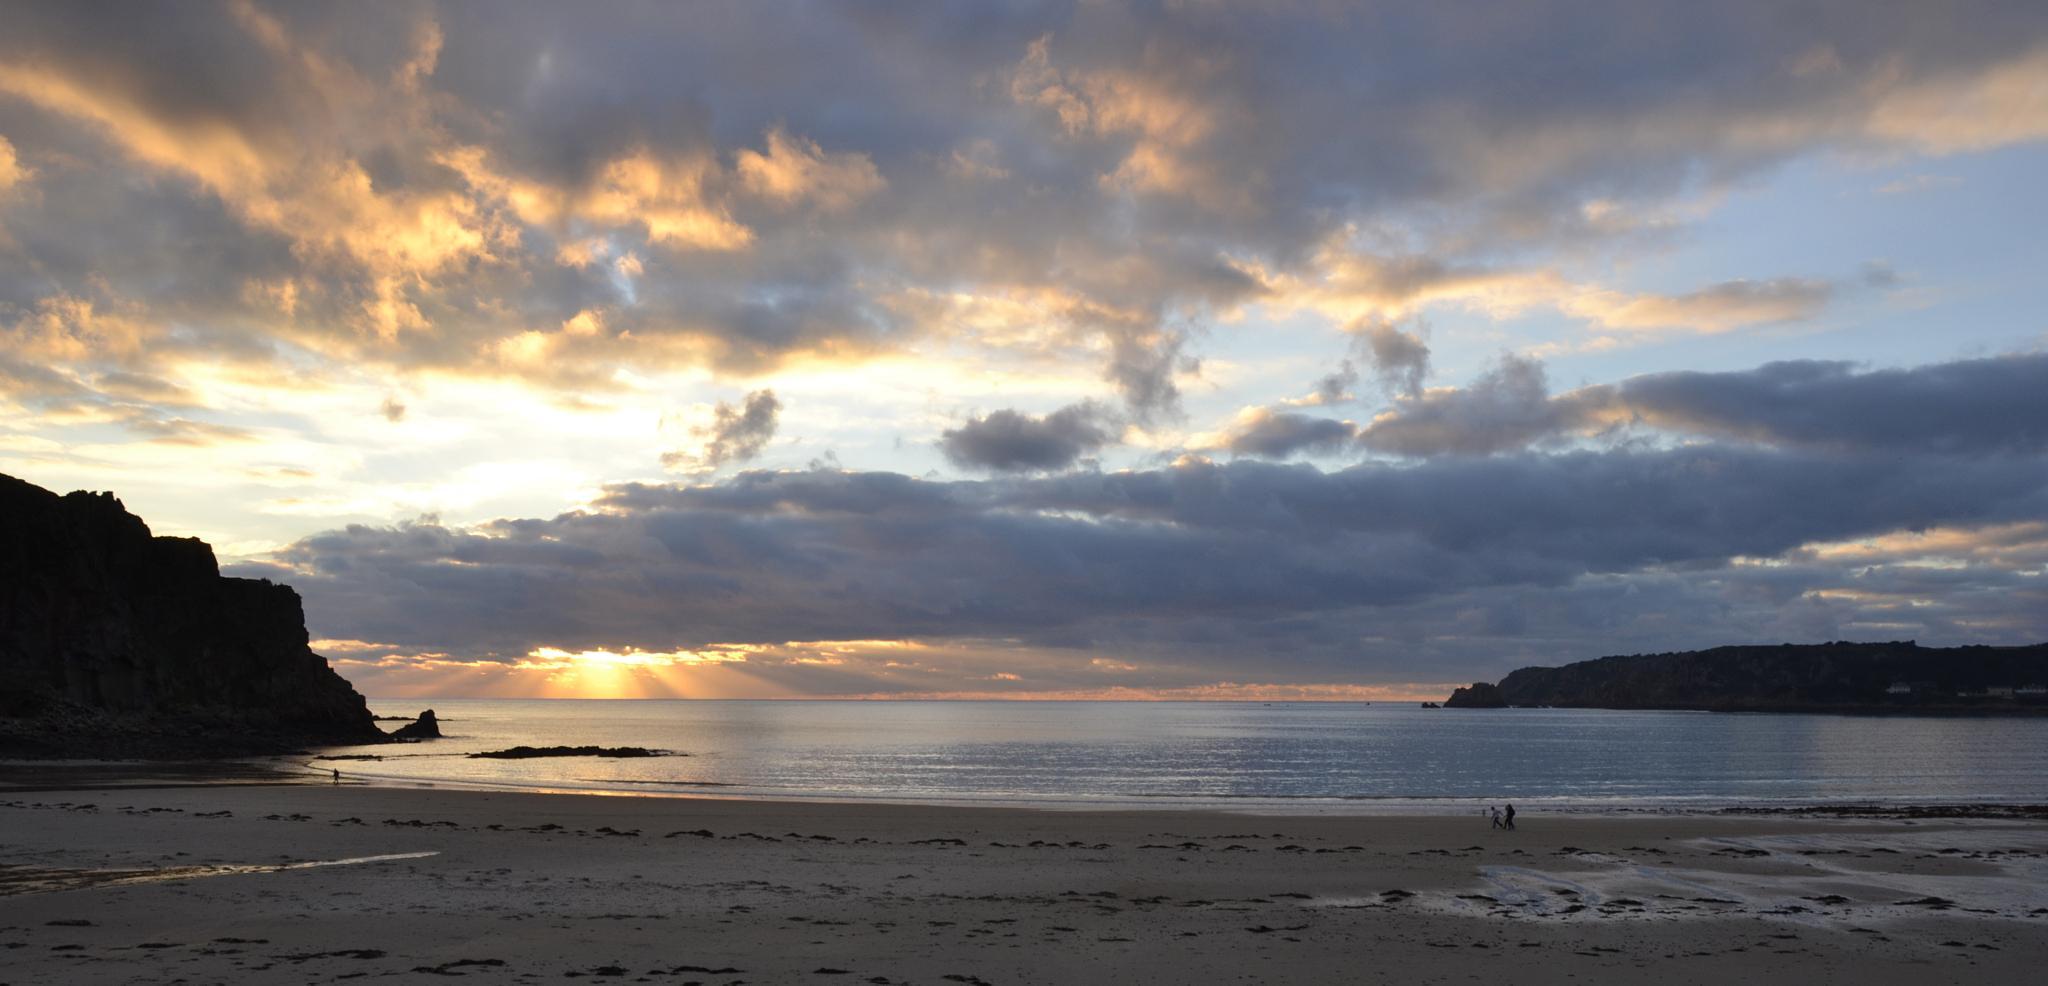 St Brelades Bay Sunset by trevor keville